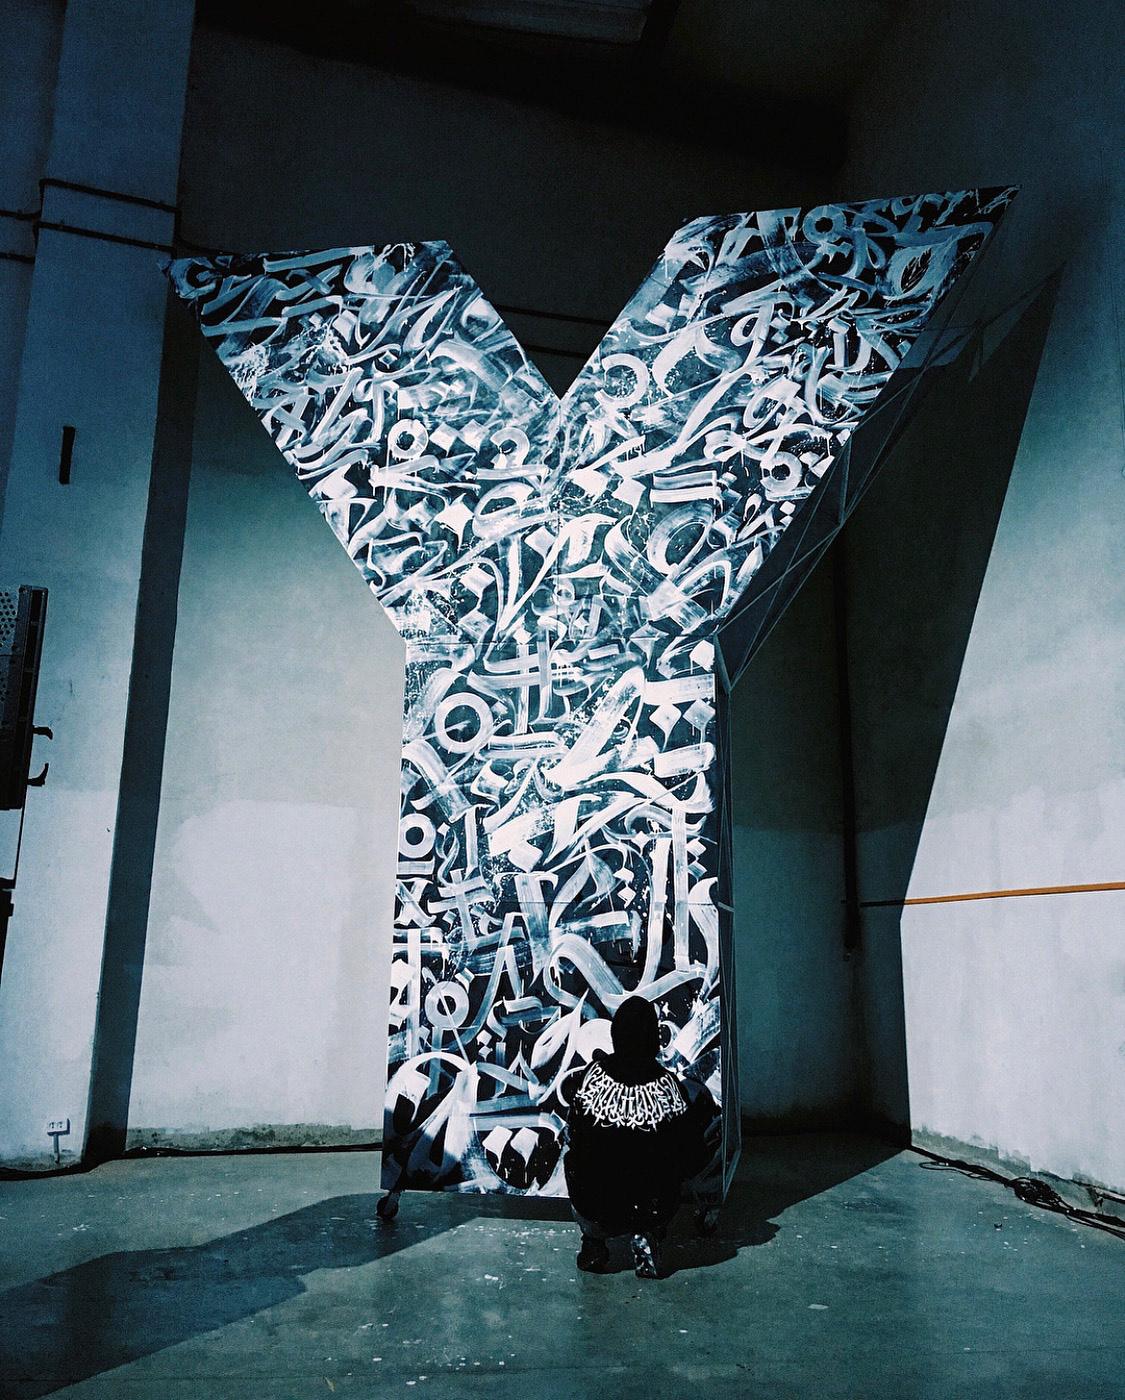 Hyundai Saint Laurent >> Pokras Lampas   Покрас Лампас - YSL Beautē ╳ Pokras Lampas: Calligraffiti Performance